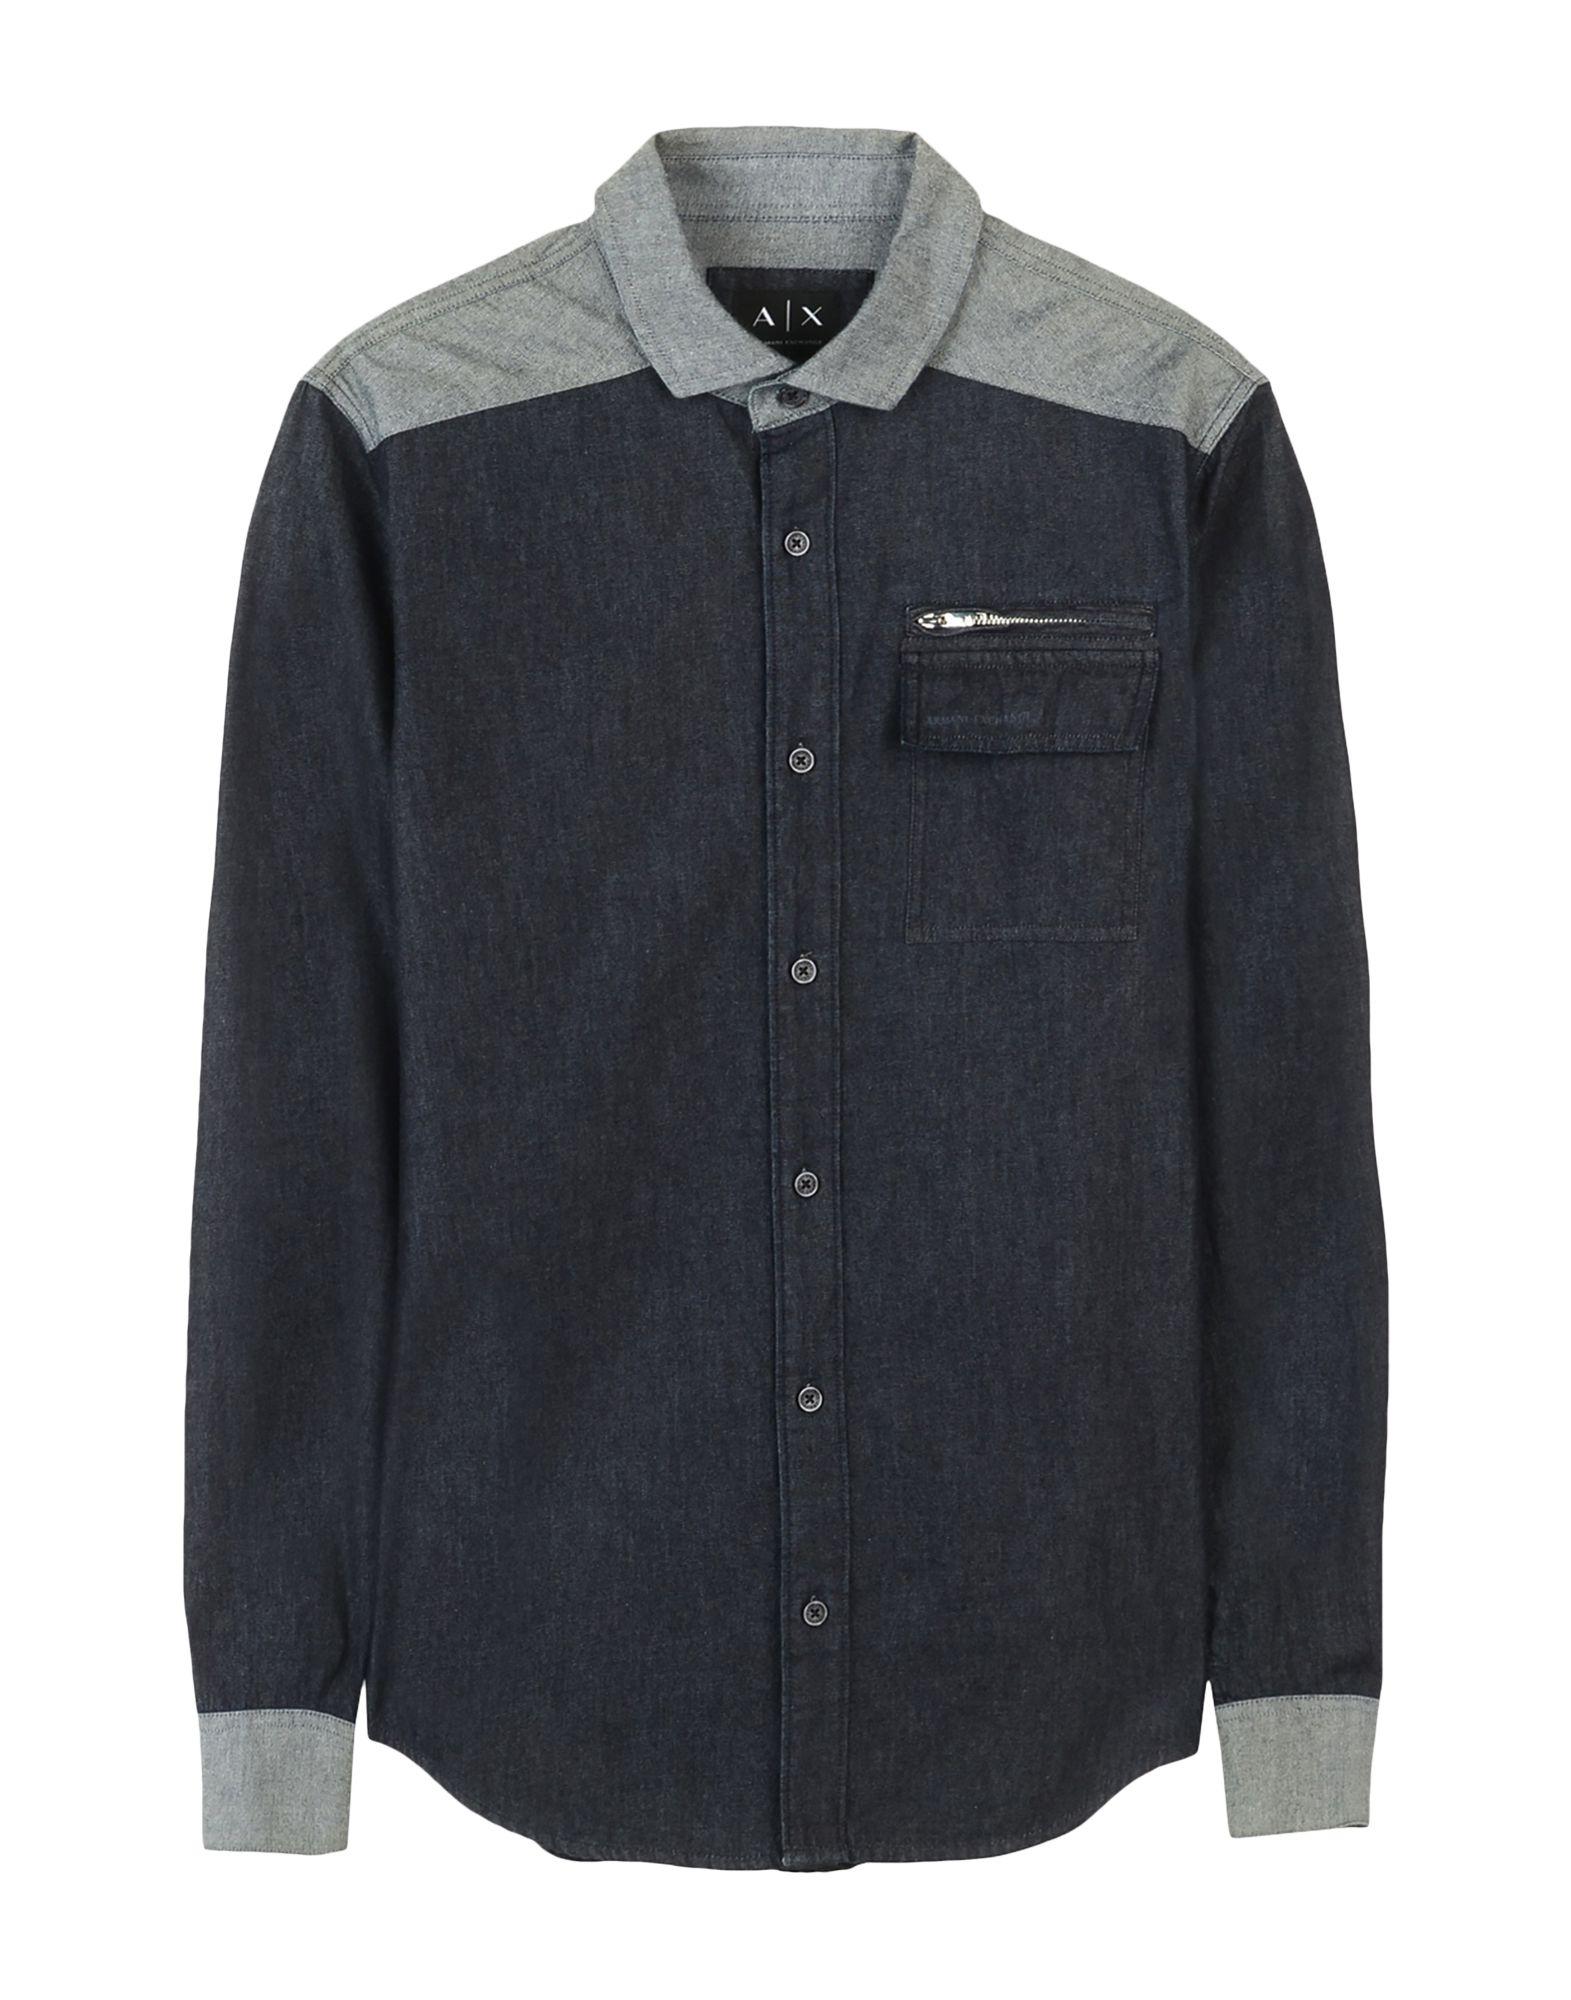 ARMANI EXCHANGE Джинсовая рубашка рубашка armani exchange 3zzc49 zndez 0118